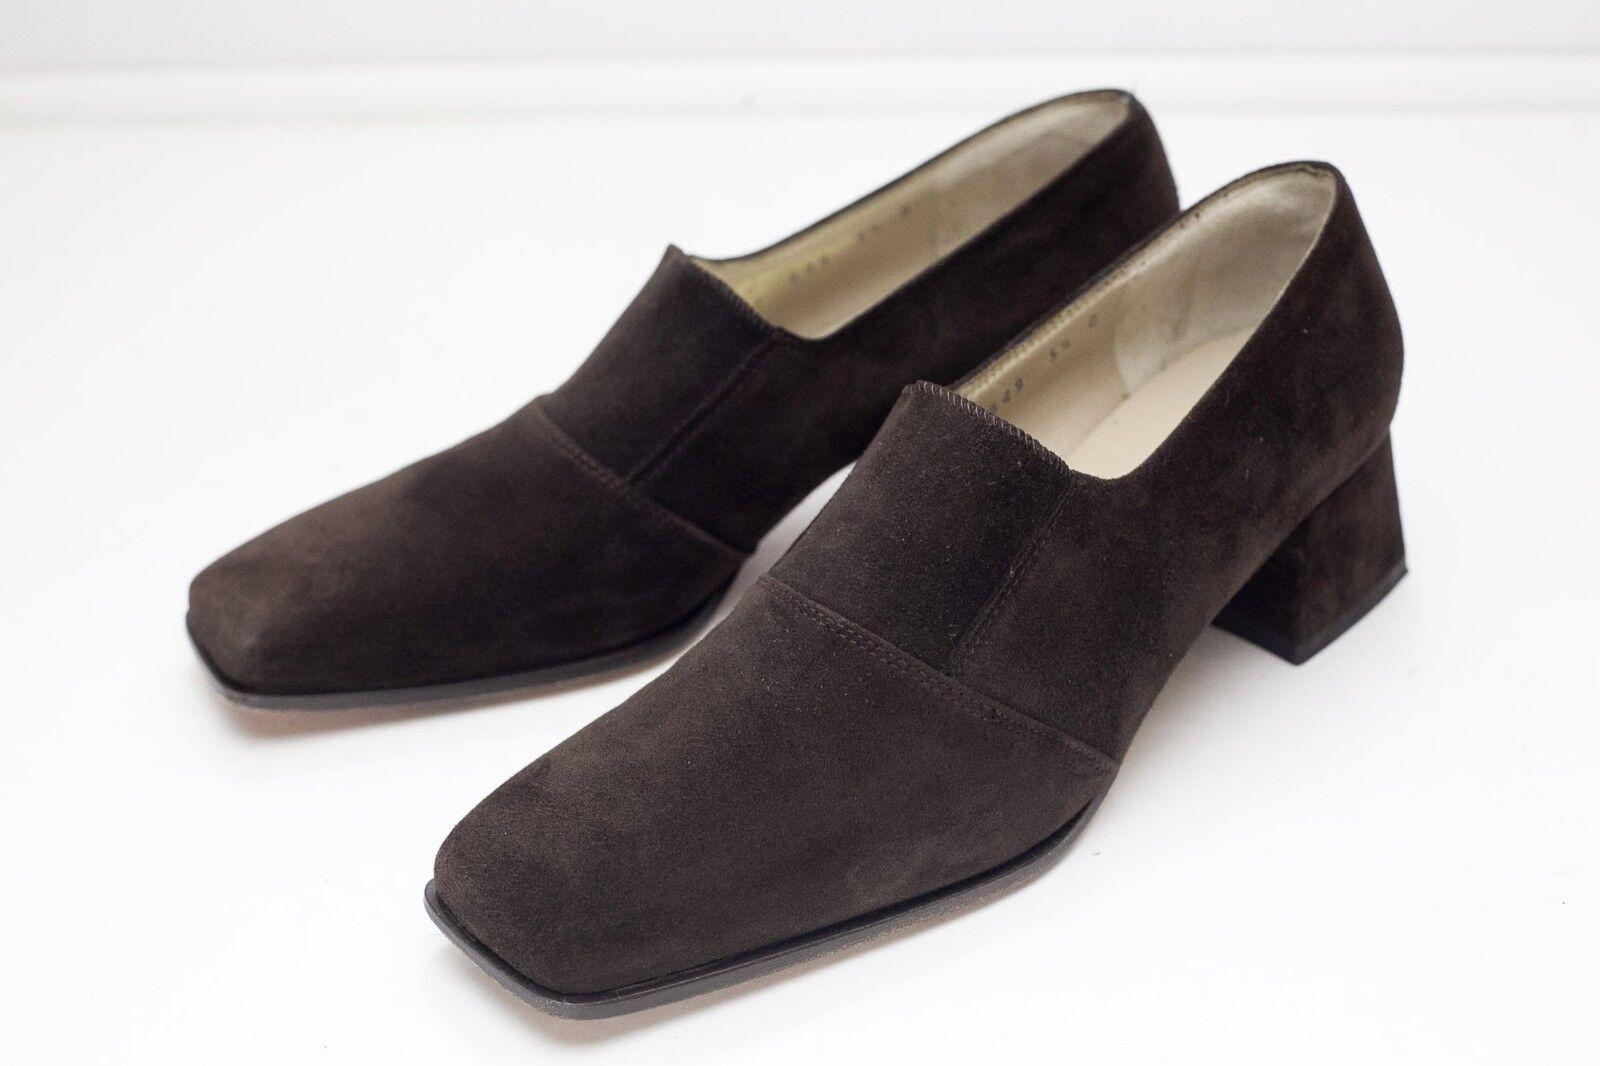 Salvatore Salvatore Salvatore Ferragamo 5.5 Gamuza Marrón Bombas Para Mujer Zapatos  para barato